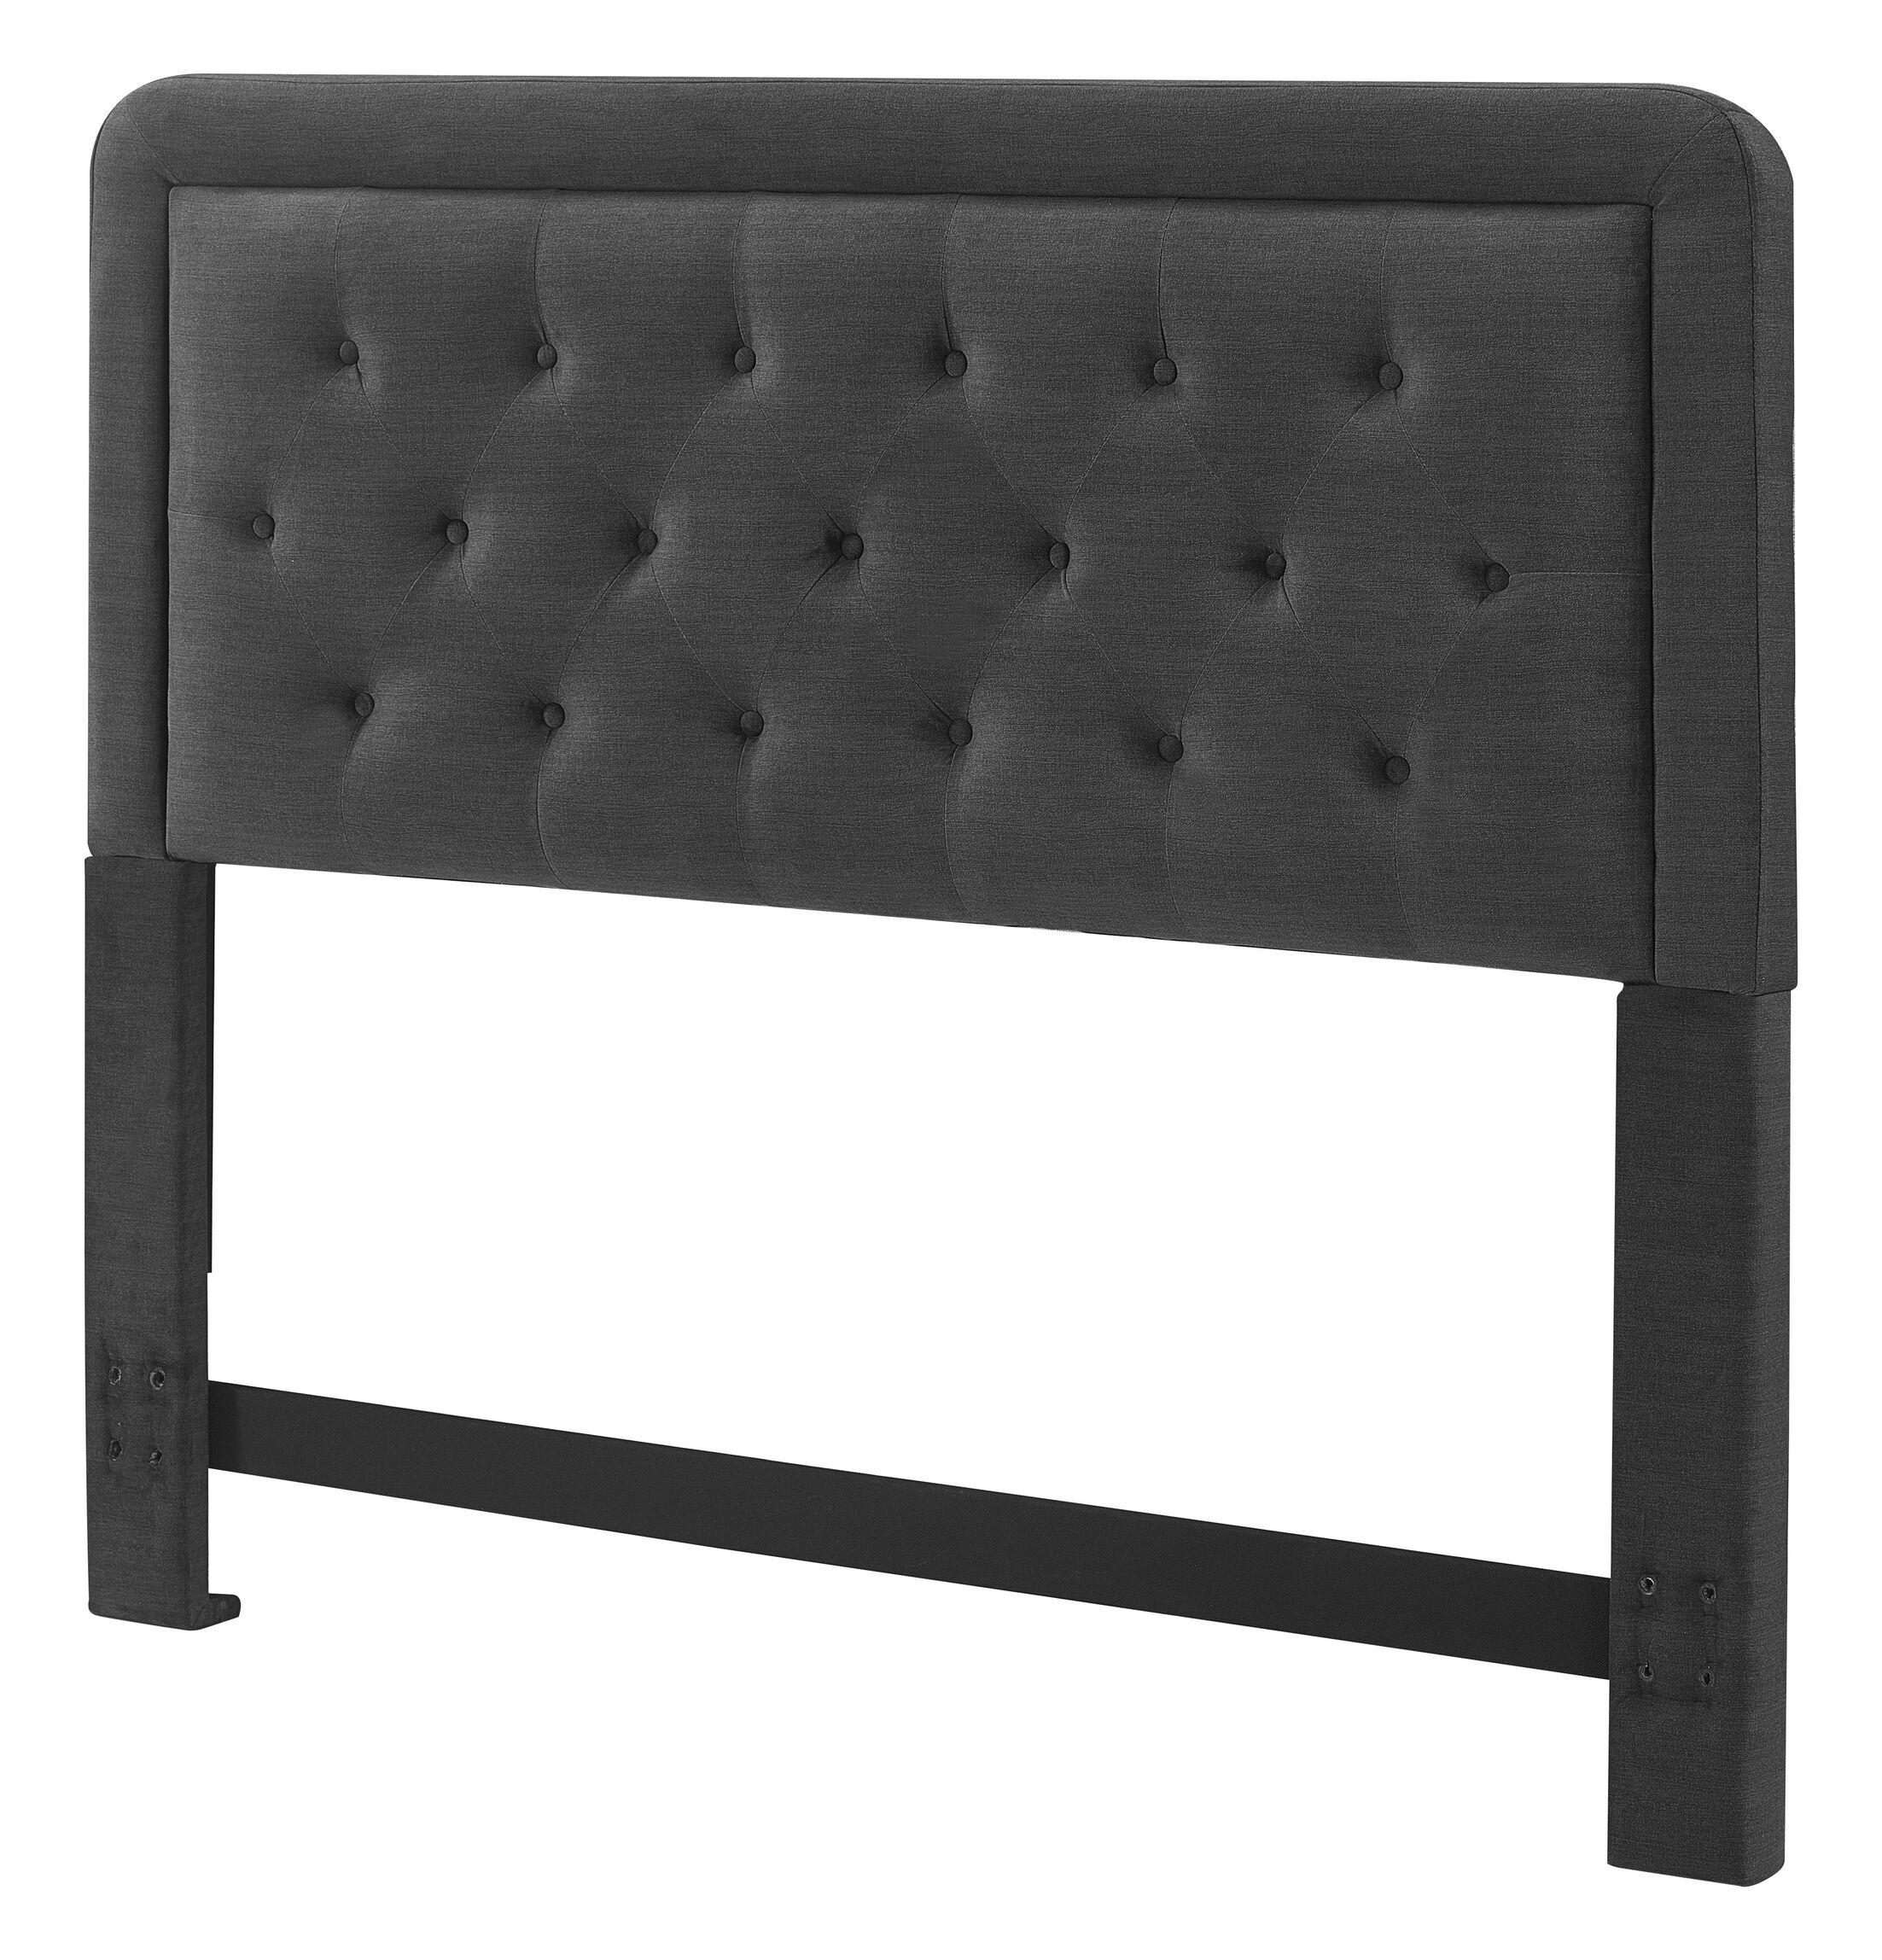 Amery Upholstered Panel Headboard Upholstery: Charcoal Gray, Size: King